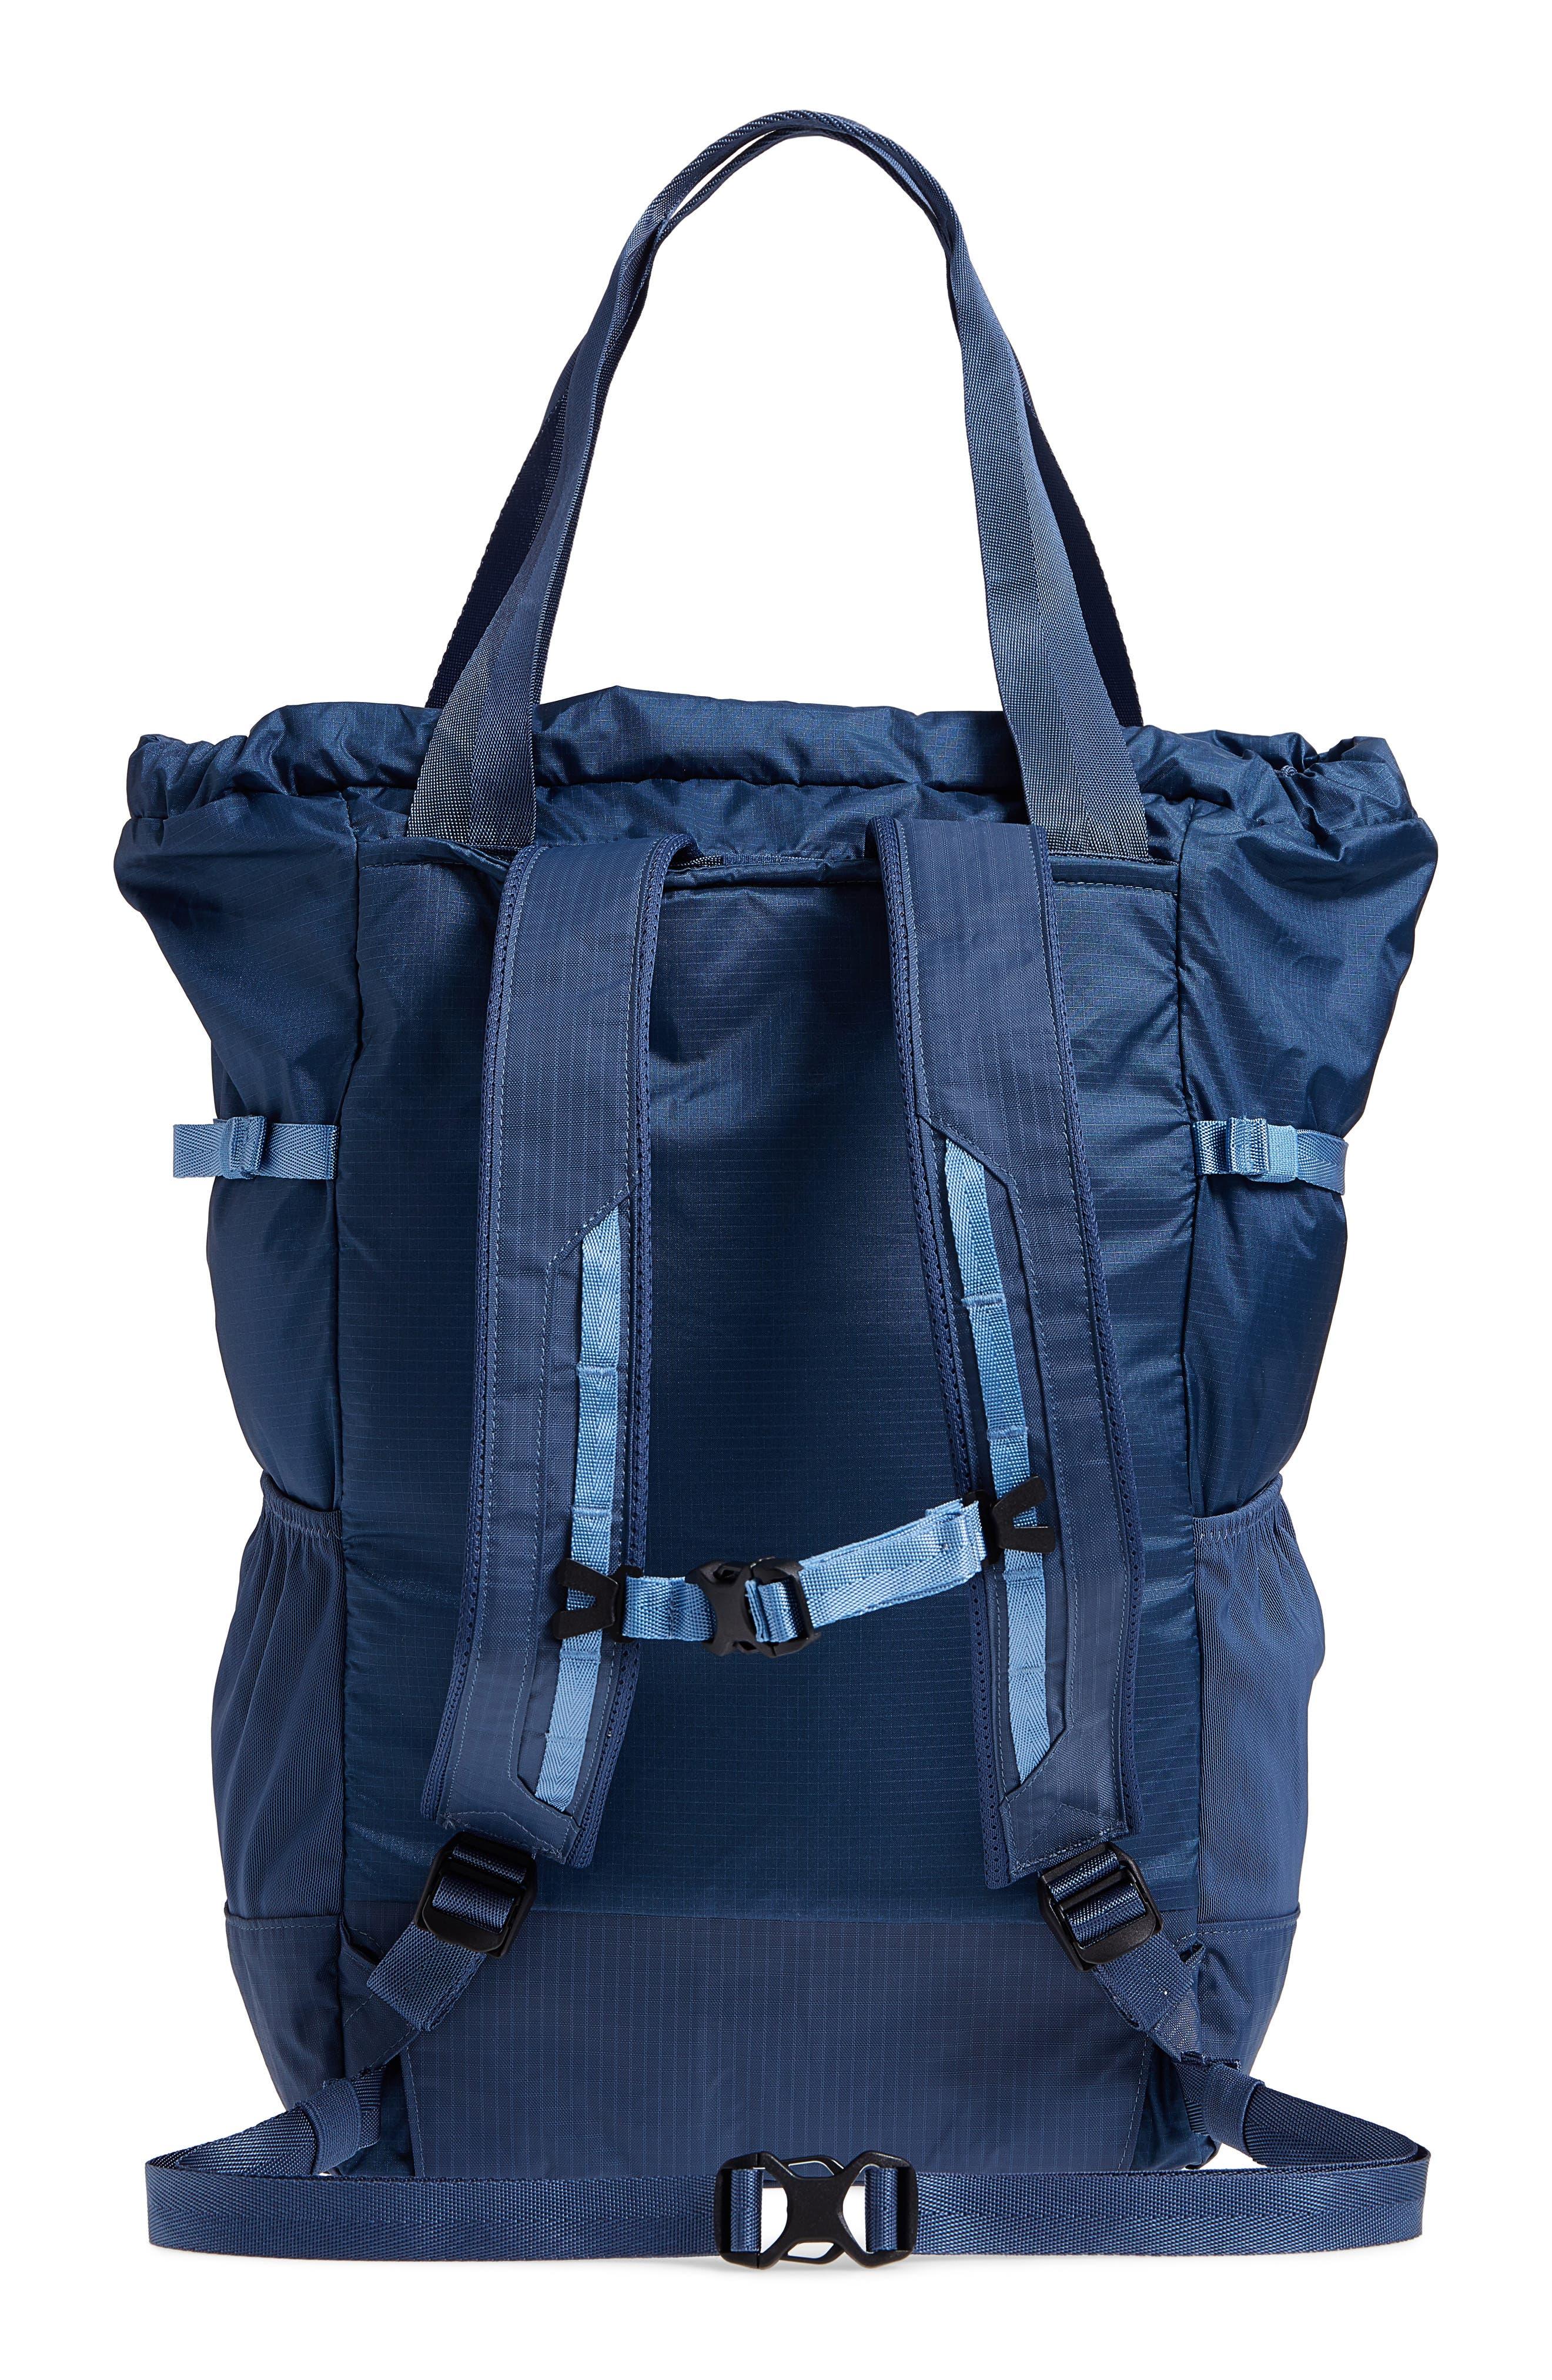 Lightweight Travel Tote Pack,                             Alternate thumbnail 3, color,                             Dolomite Blue